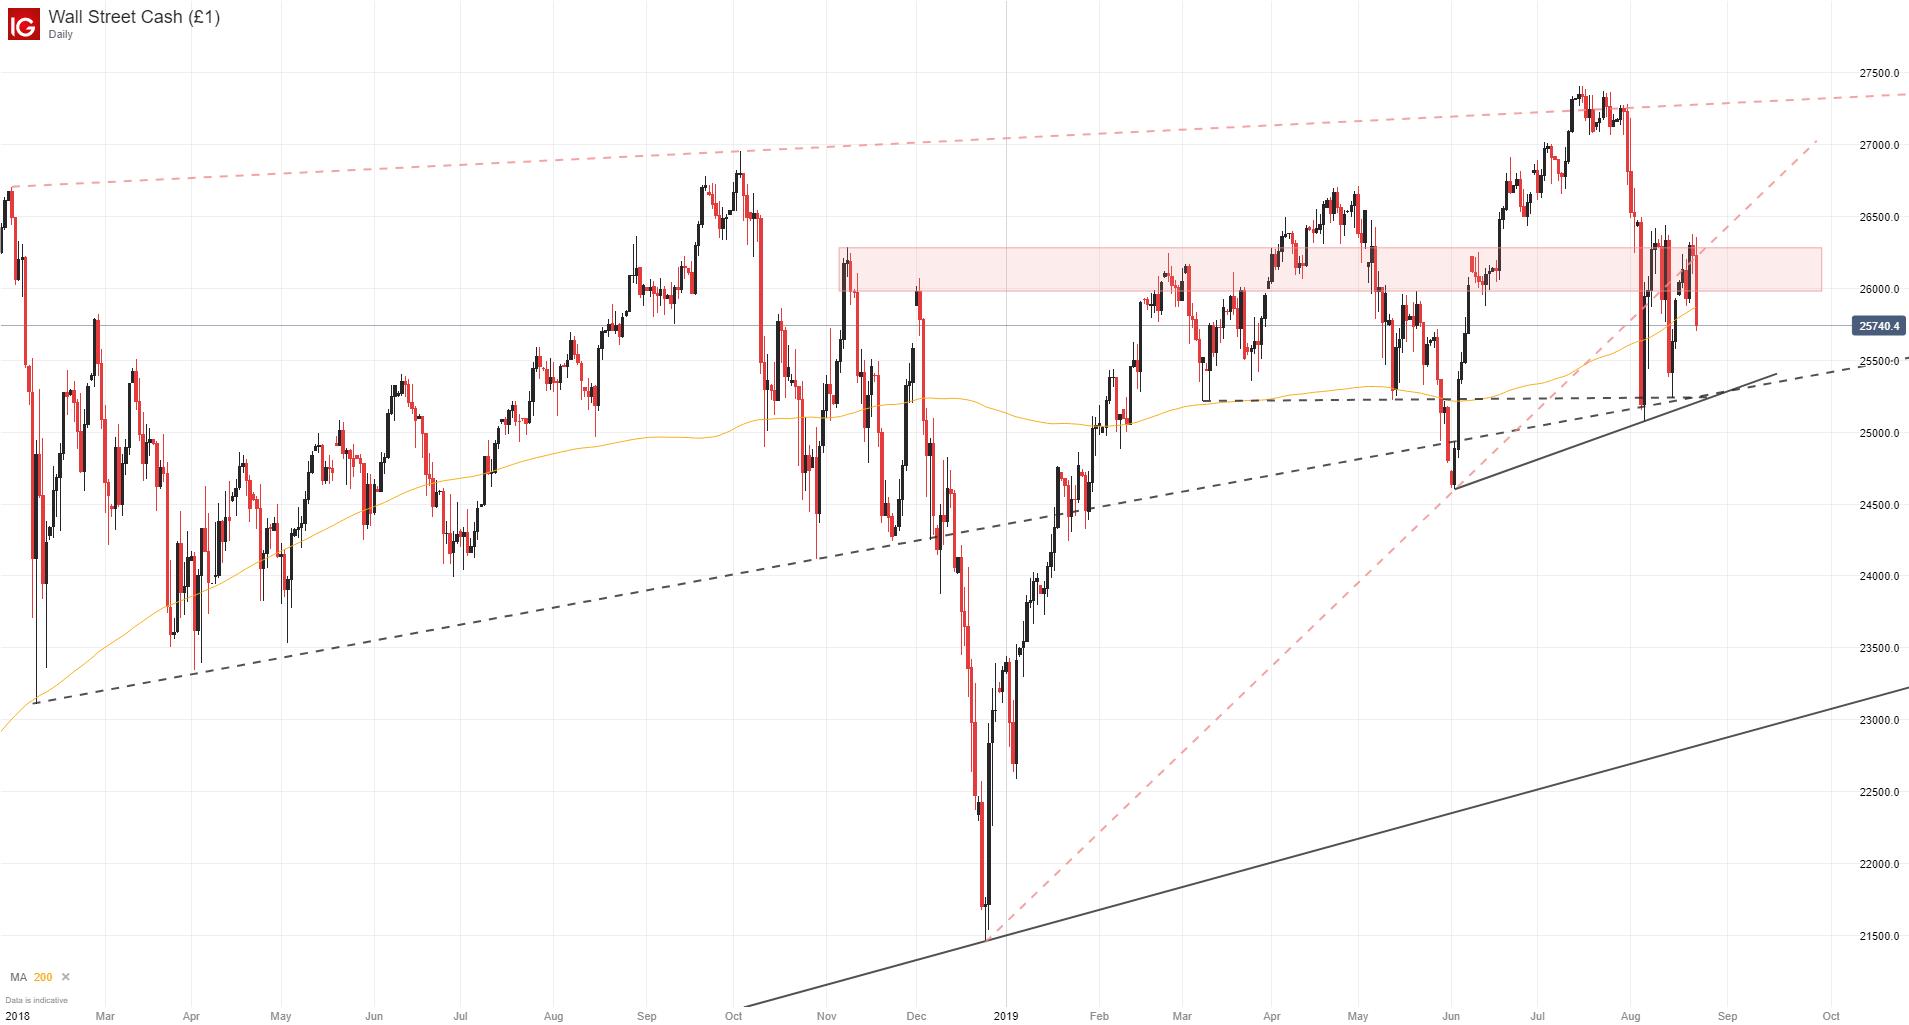 Dow Jones, Nasdaq 100, CAC 40, DAX 30 Fundamental Forecasts